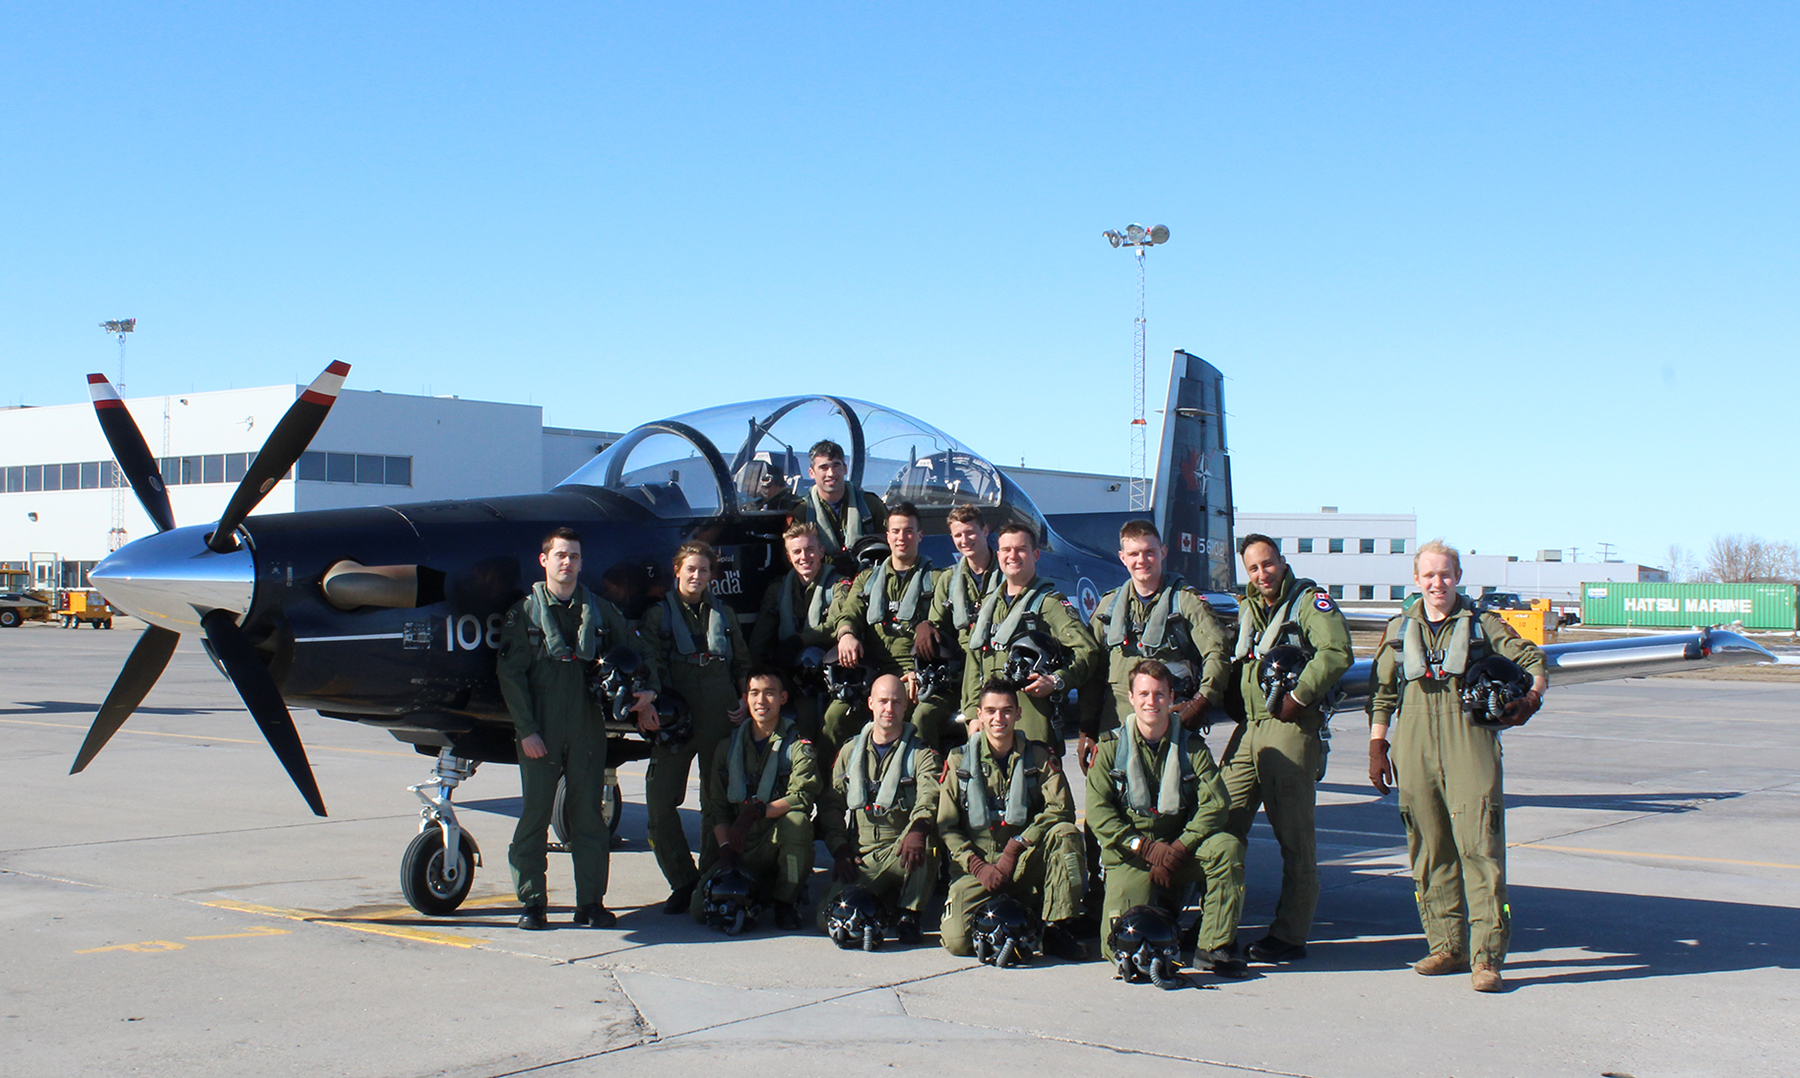 c4e03e3dee NATO Flying Training in Canada program makes history - Skies Mag